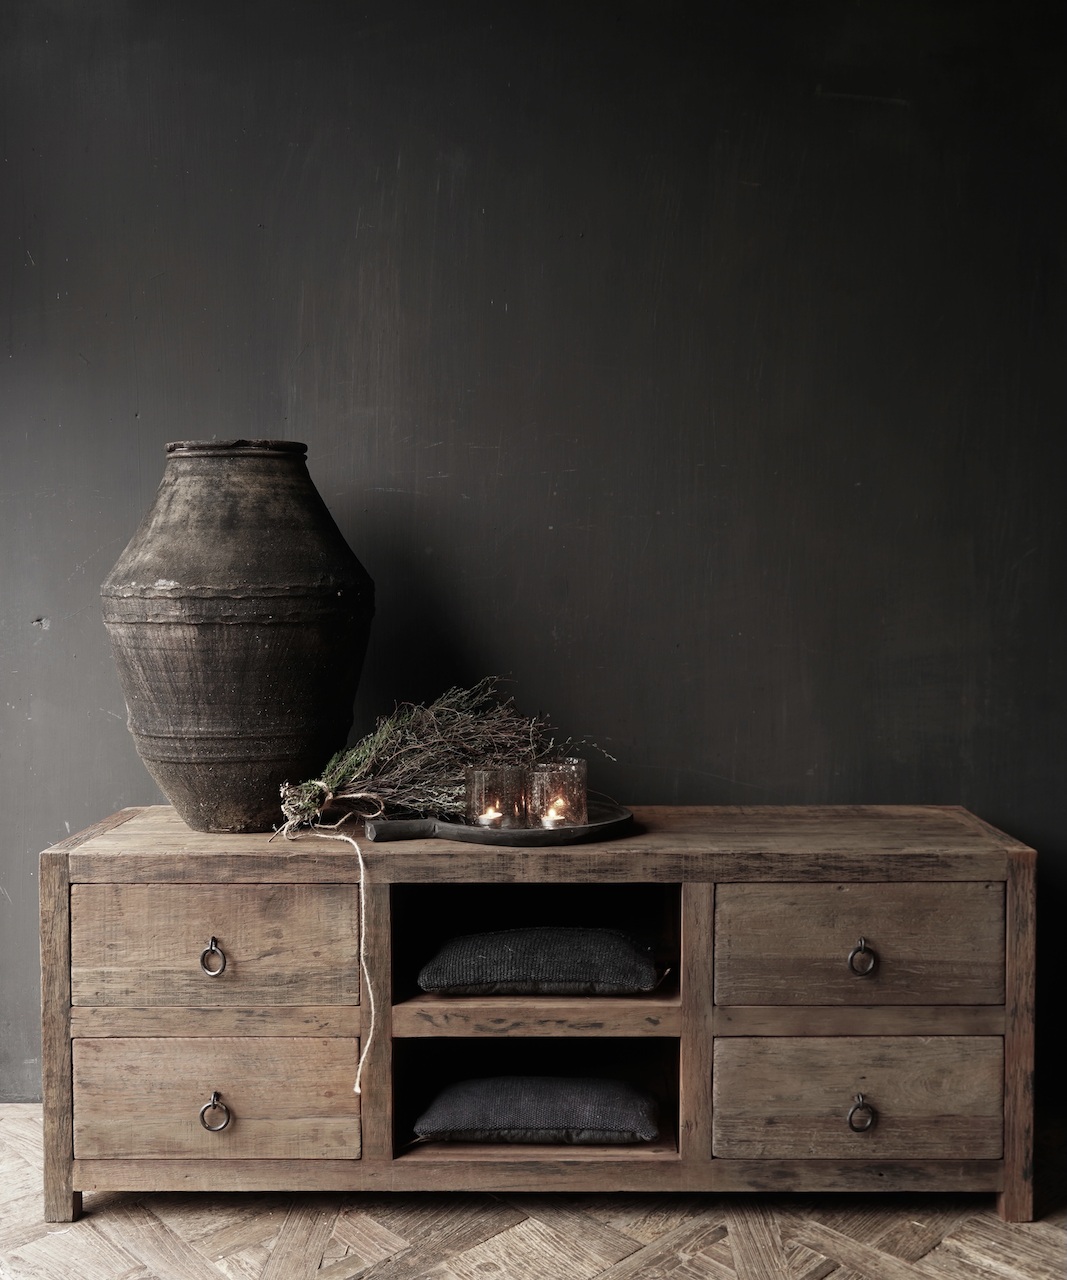 RESERVED TV Furniture / sideboard of old wood-1